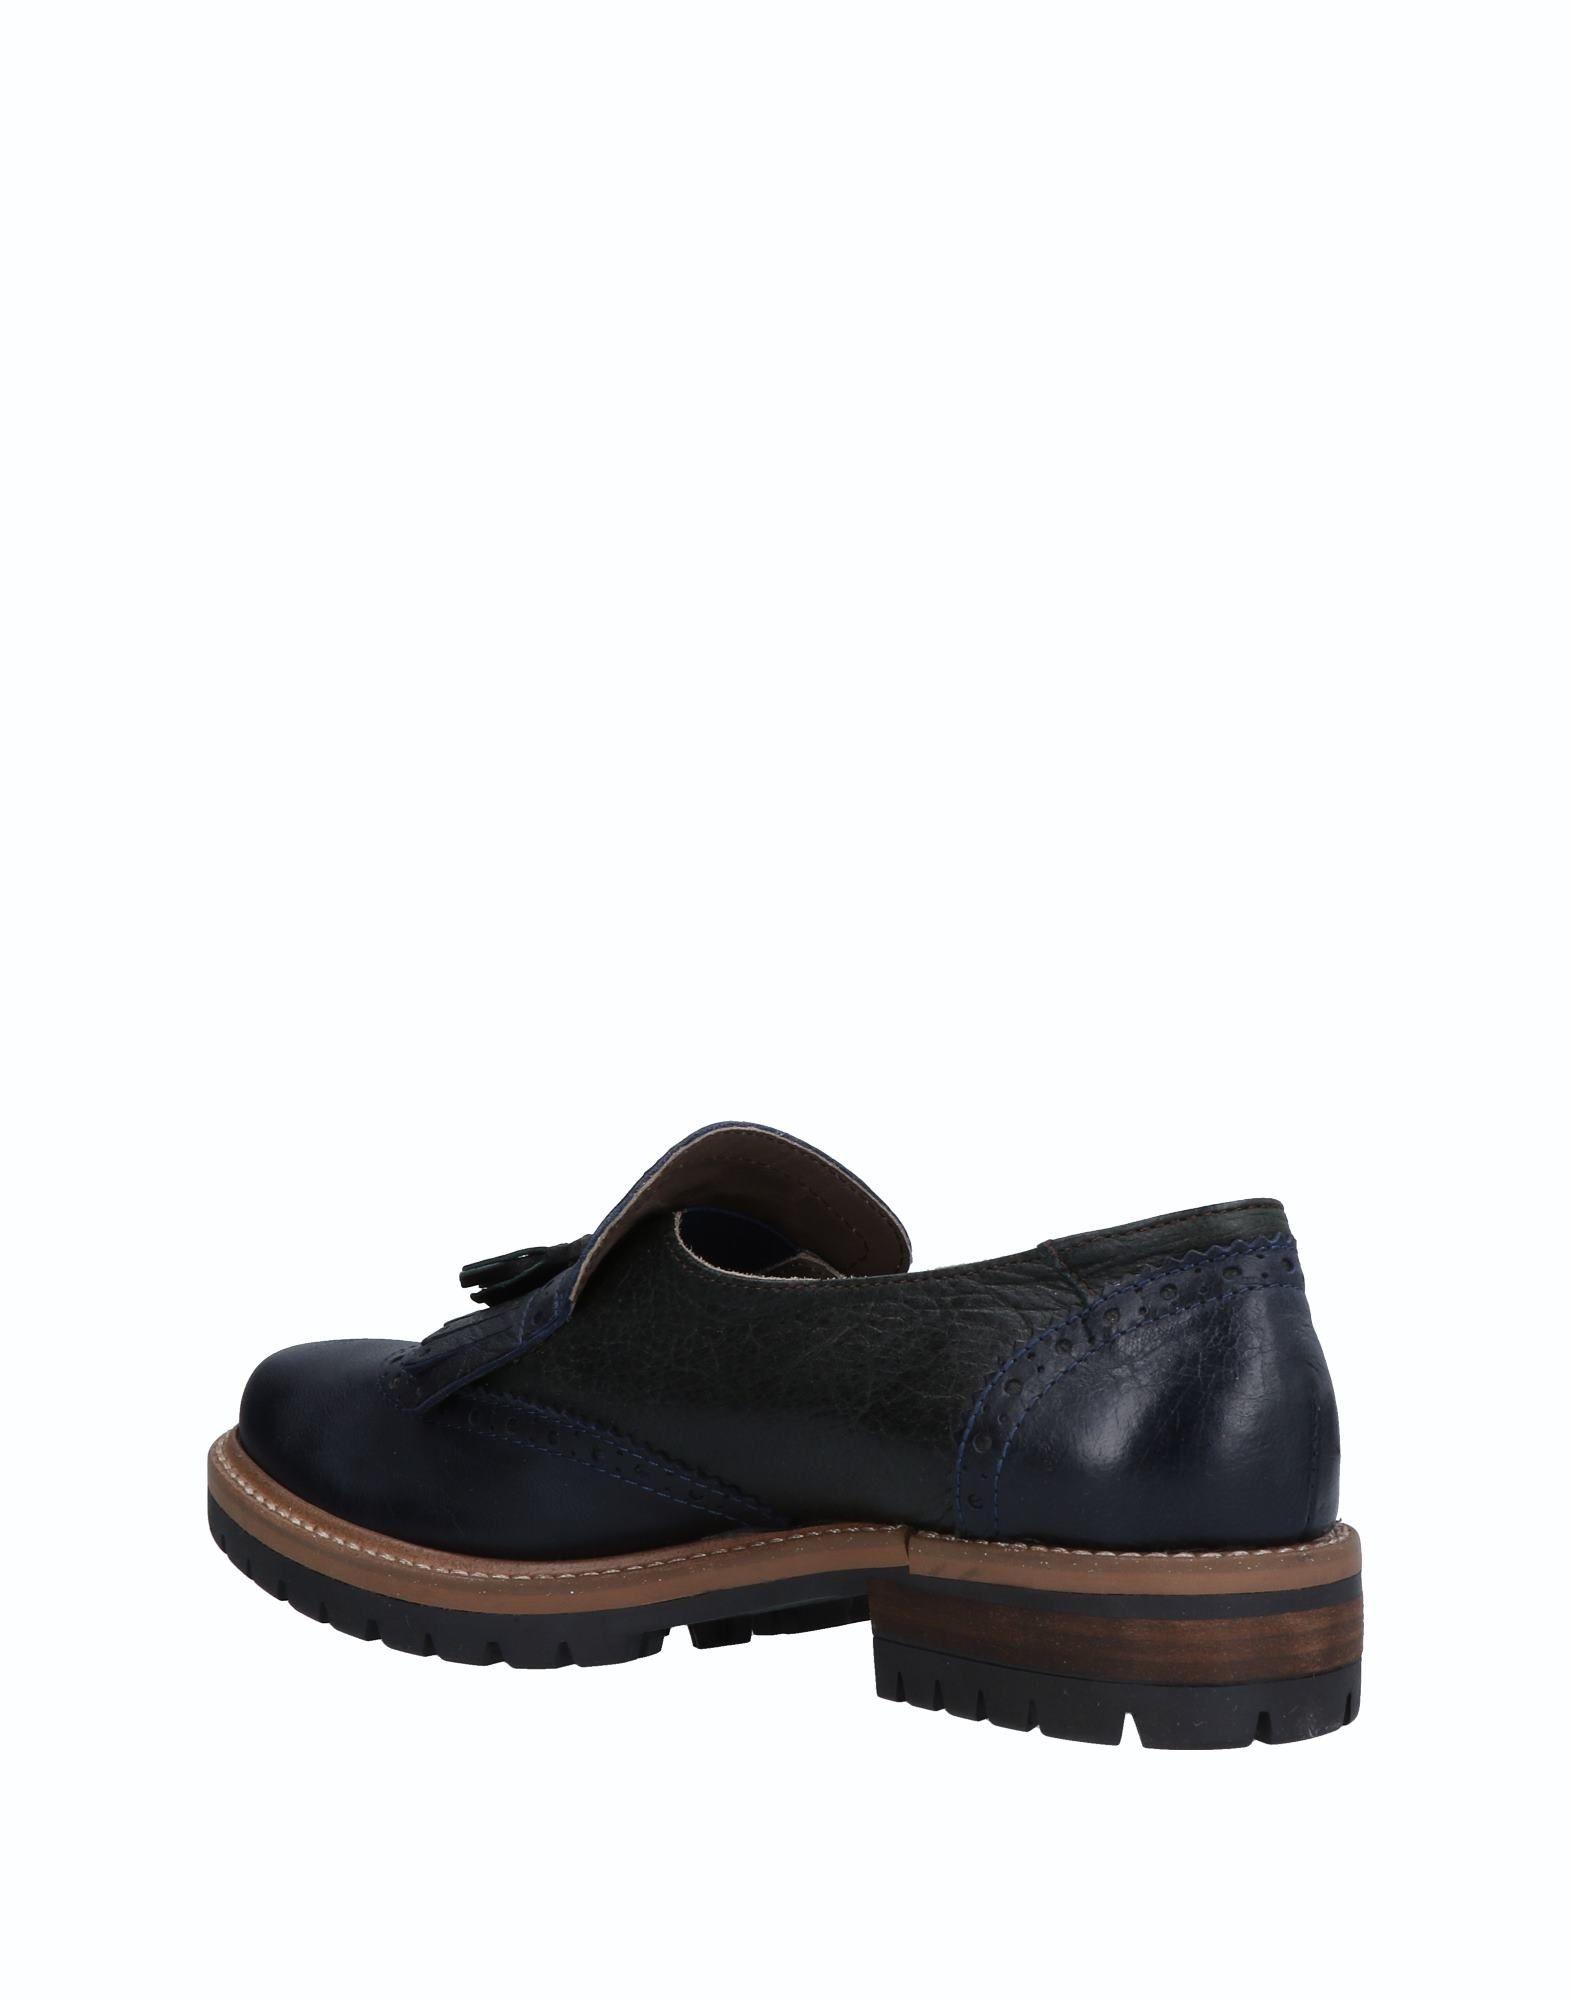 Gazel Loafers - Women Gazel Loafers online on    United Kingdom - 11390950VO 159adc